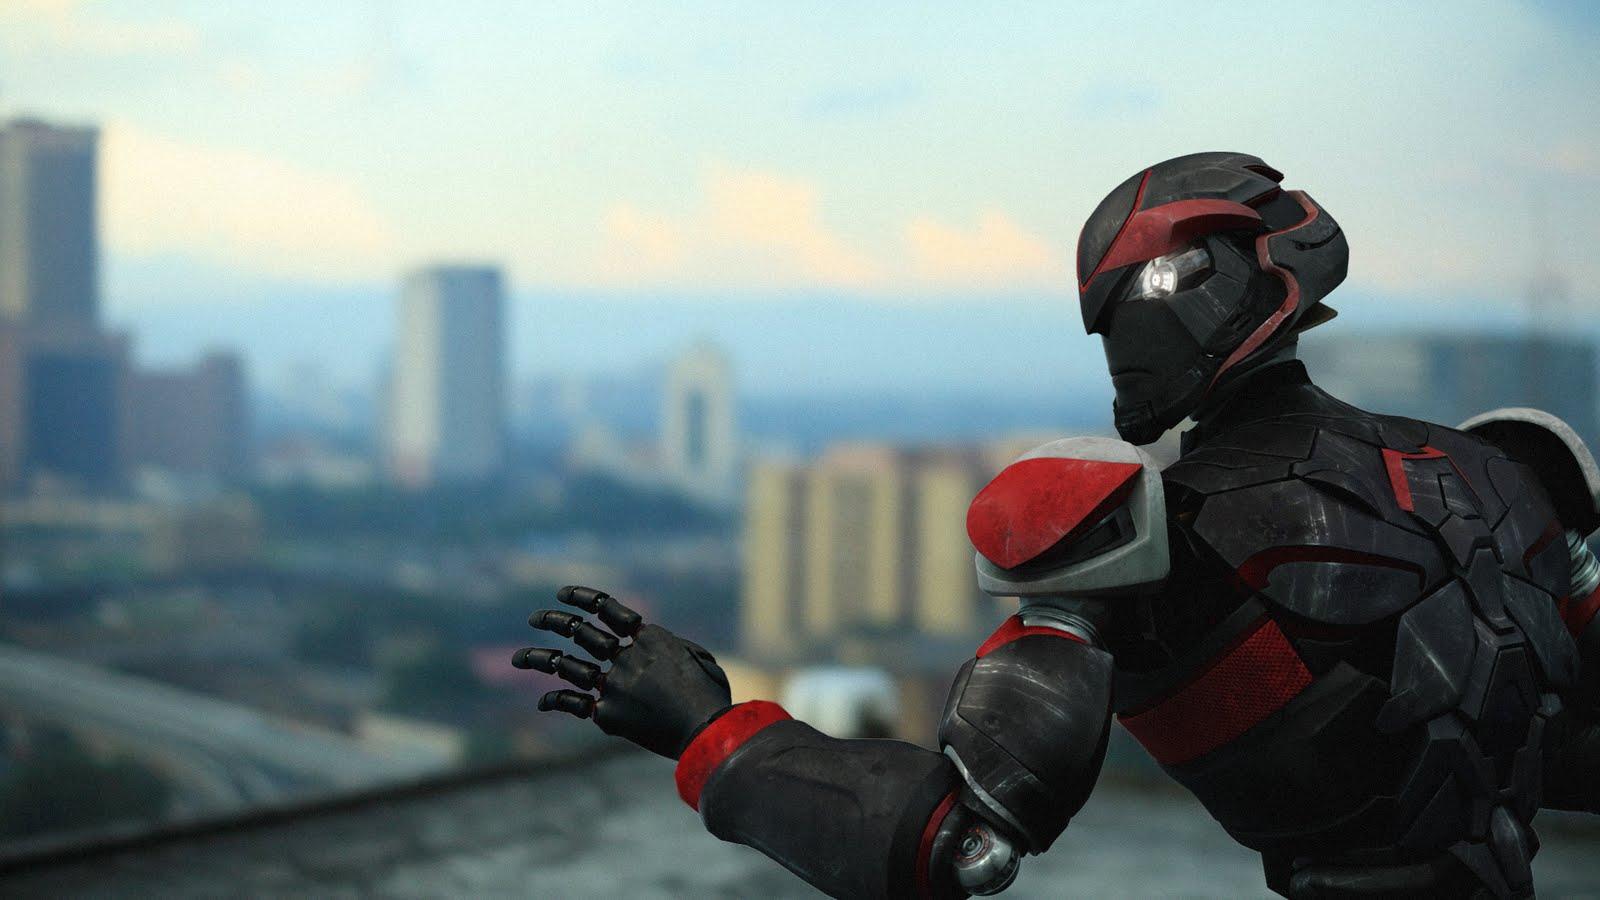 Vektor 58 Drama Aksi Robot Karya Anak Tempatan